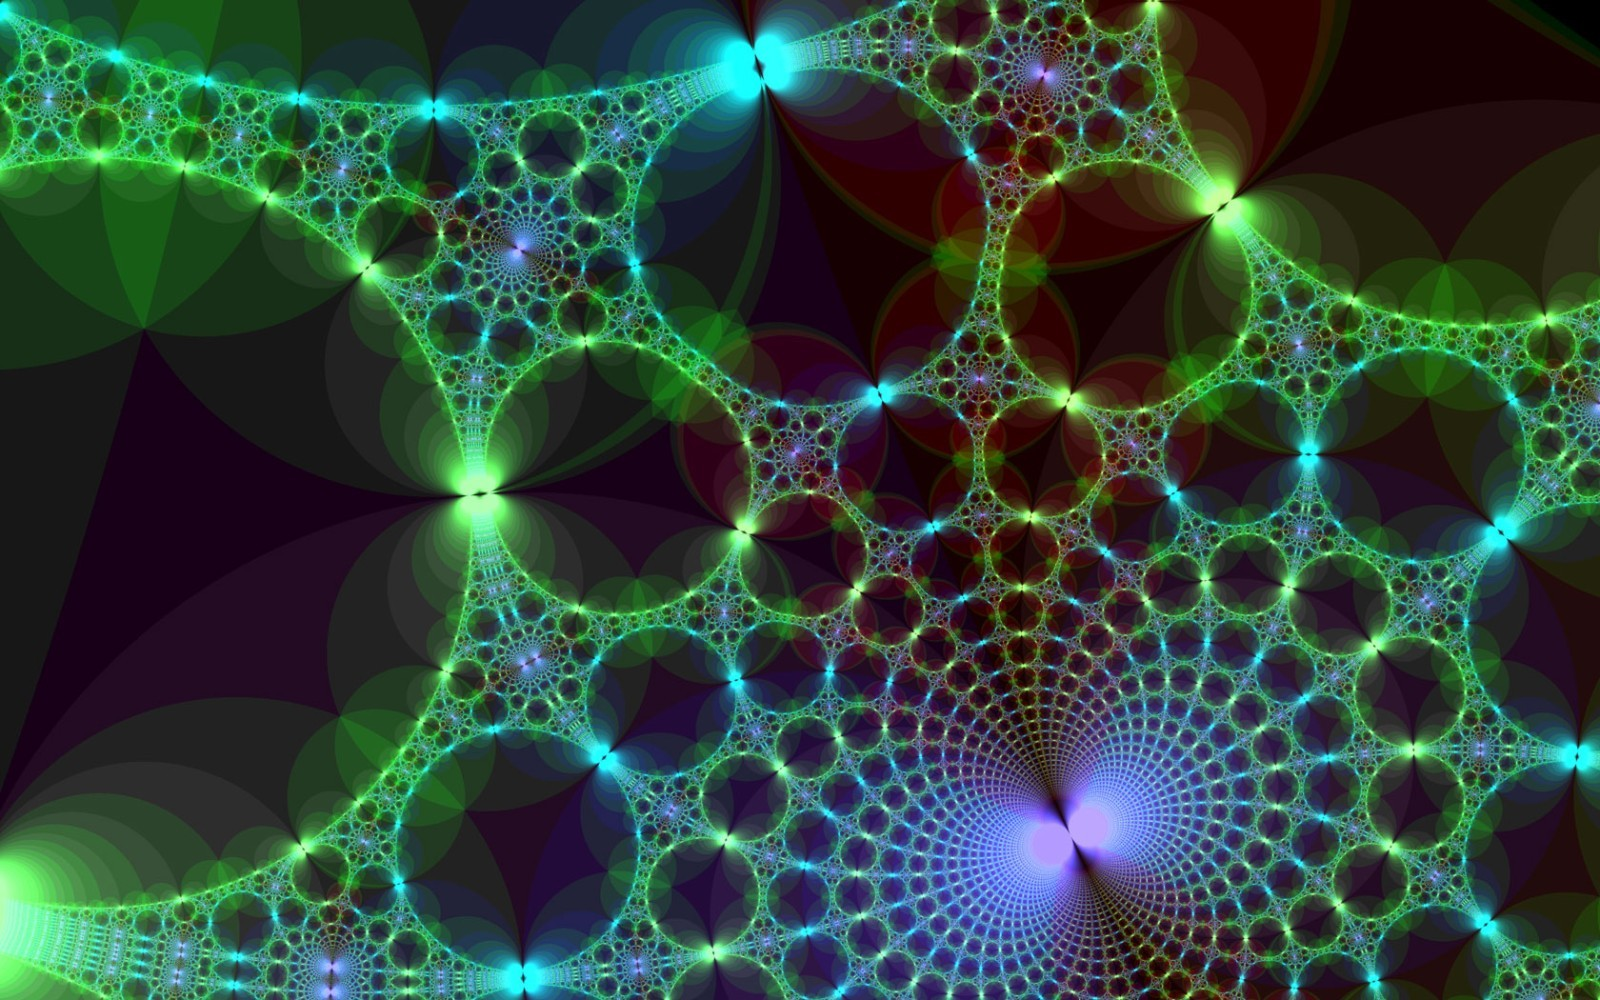 Sommes nous seuls dans l'univers? Web-fractalj1377-2fb3b